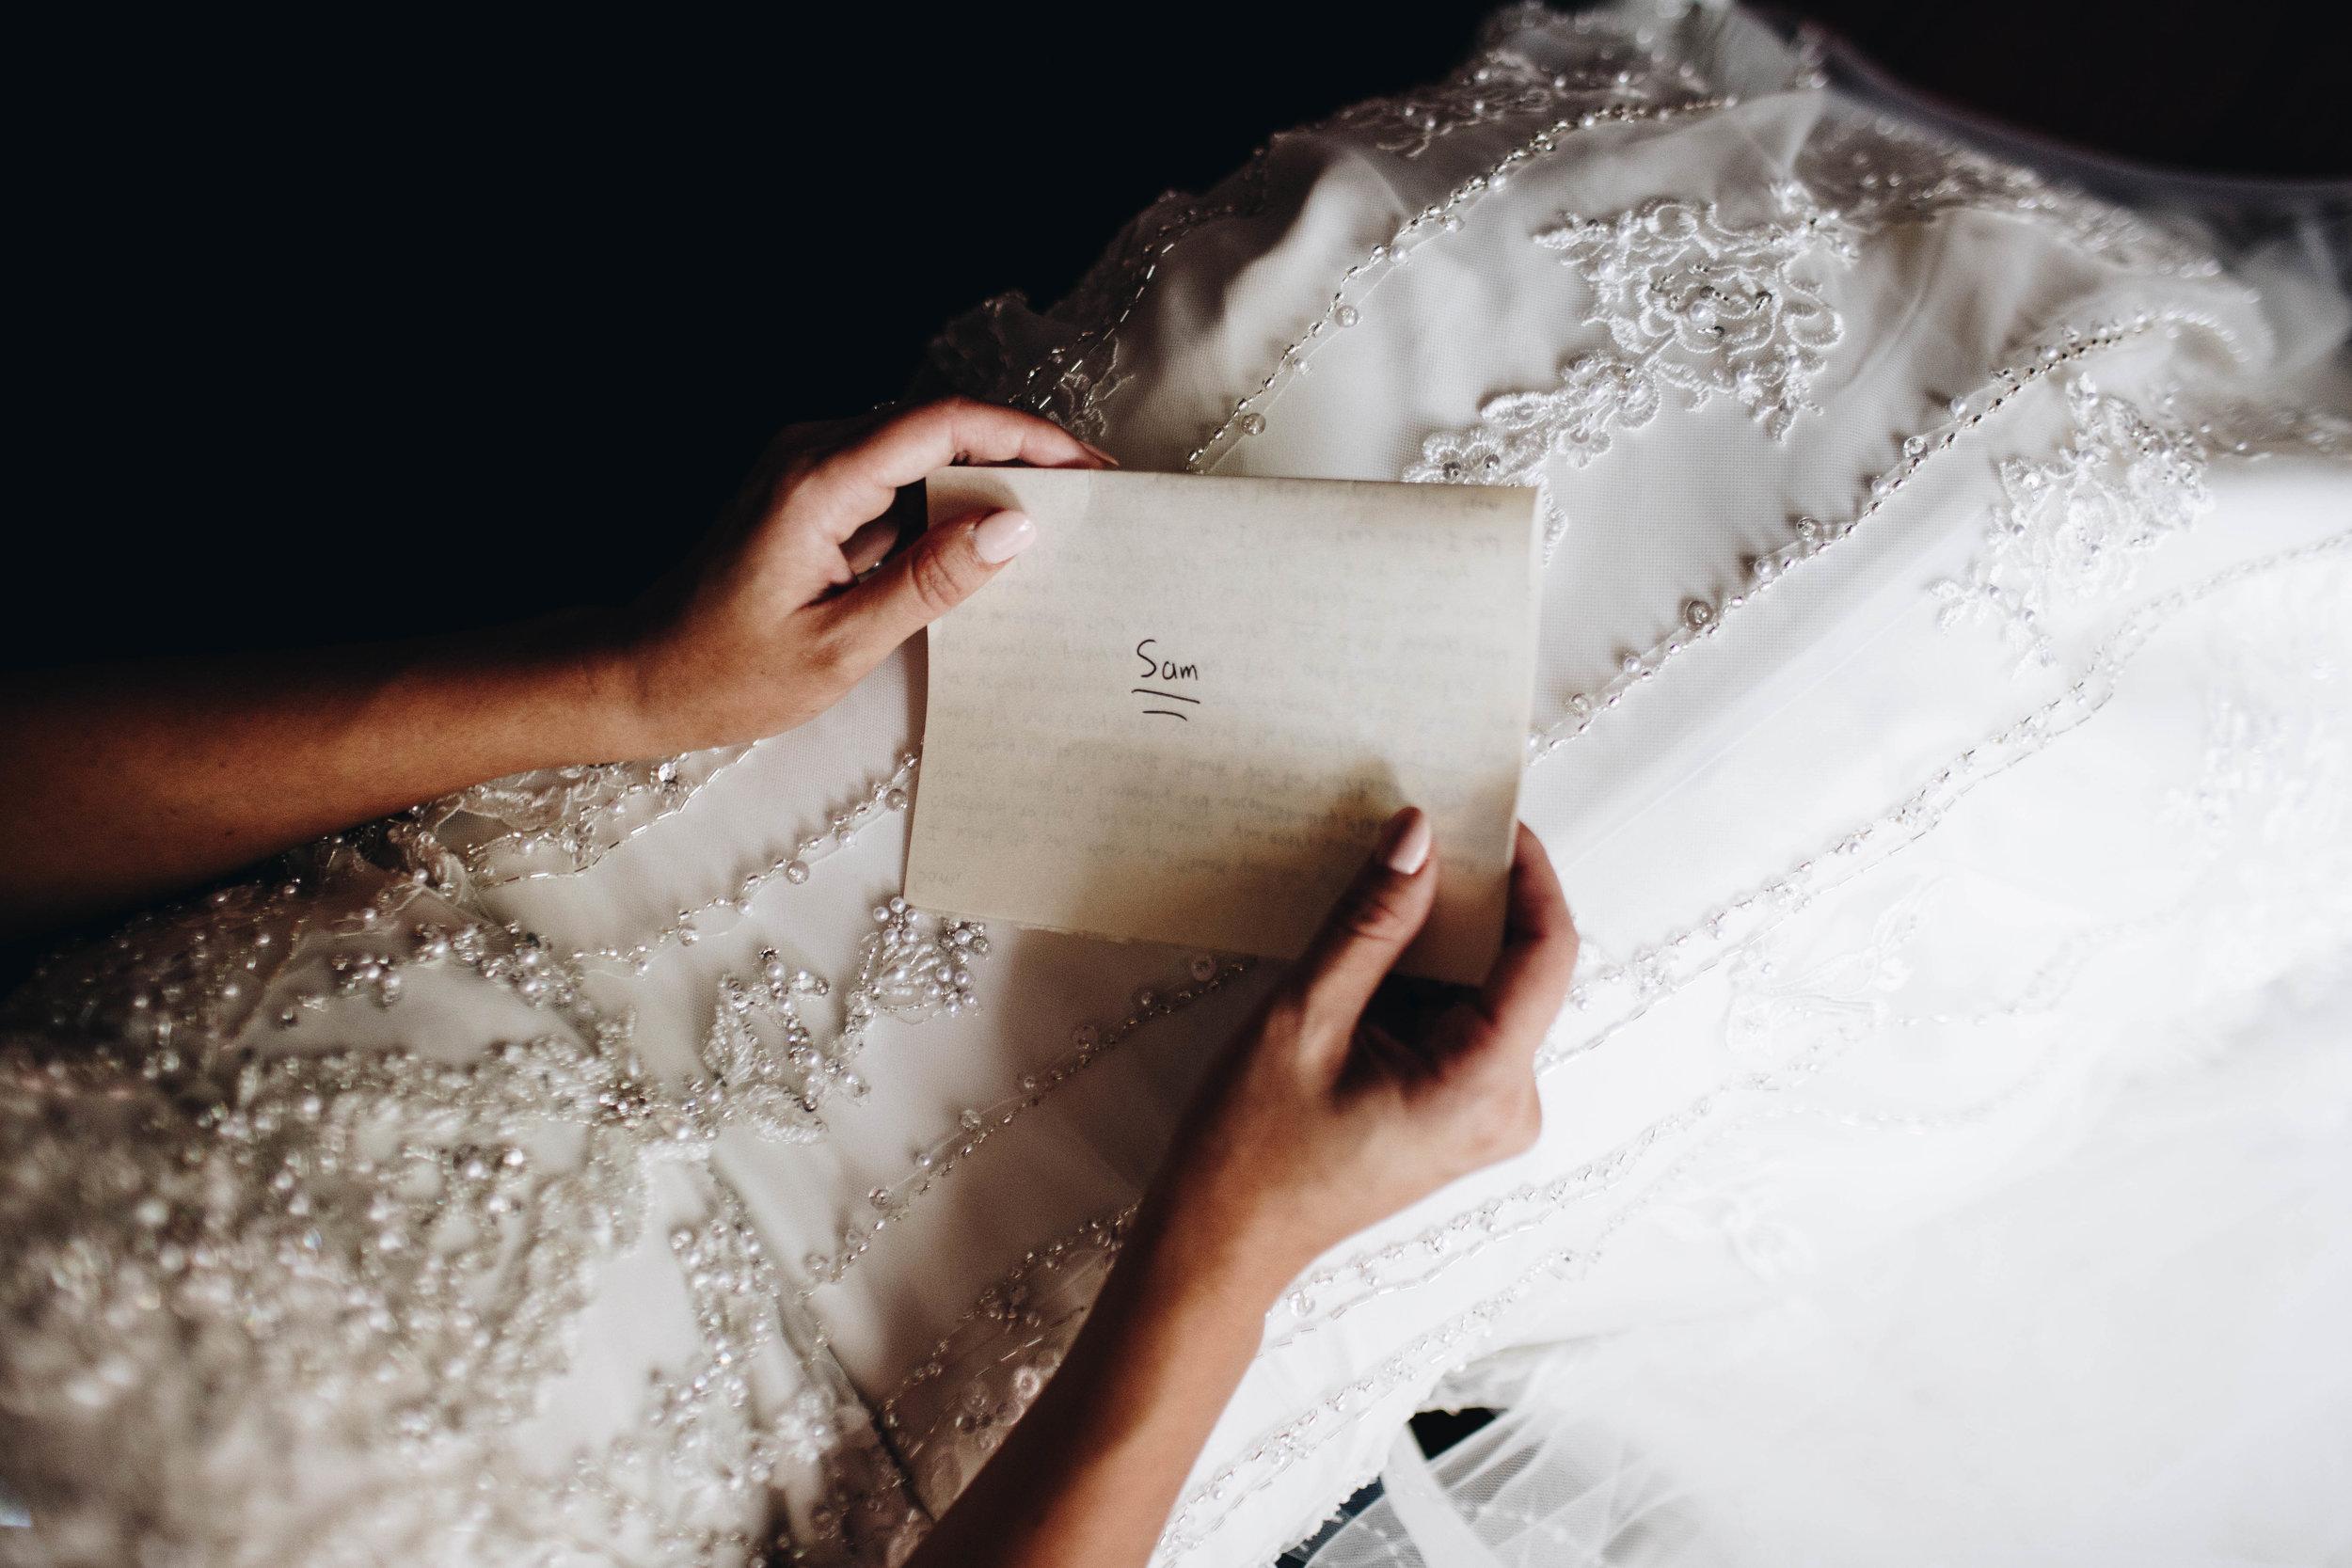 1bcf3-luxmoregrandestatewedding.jpgluxmoregrandestatewedding.jpg